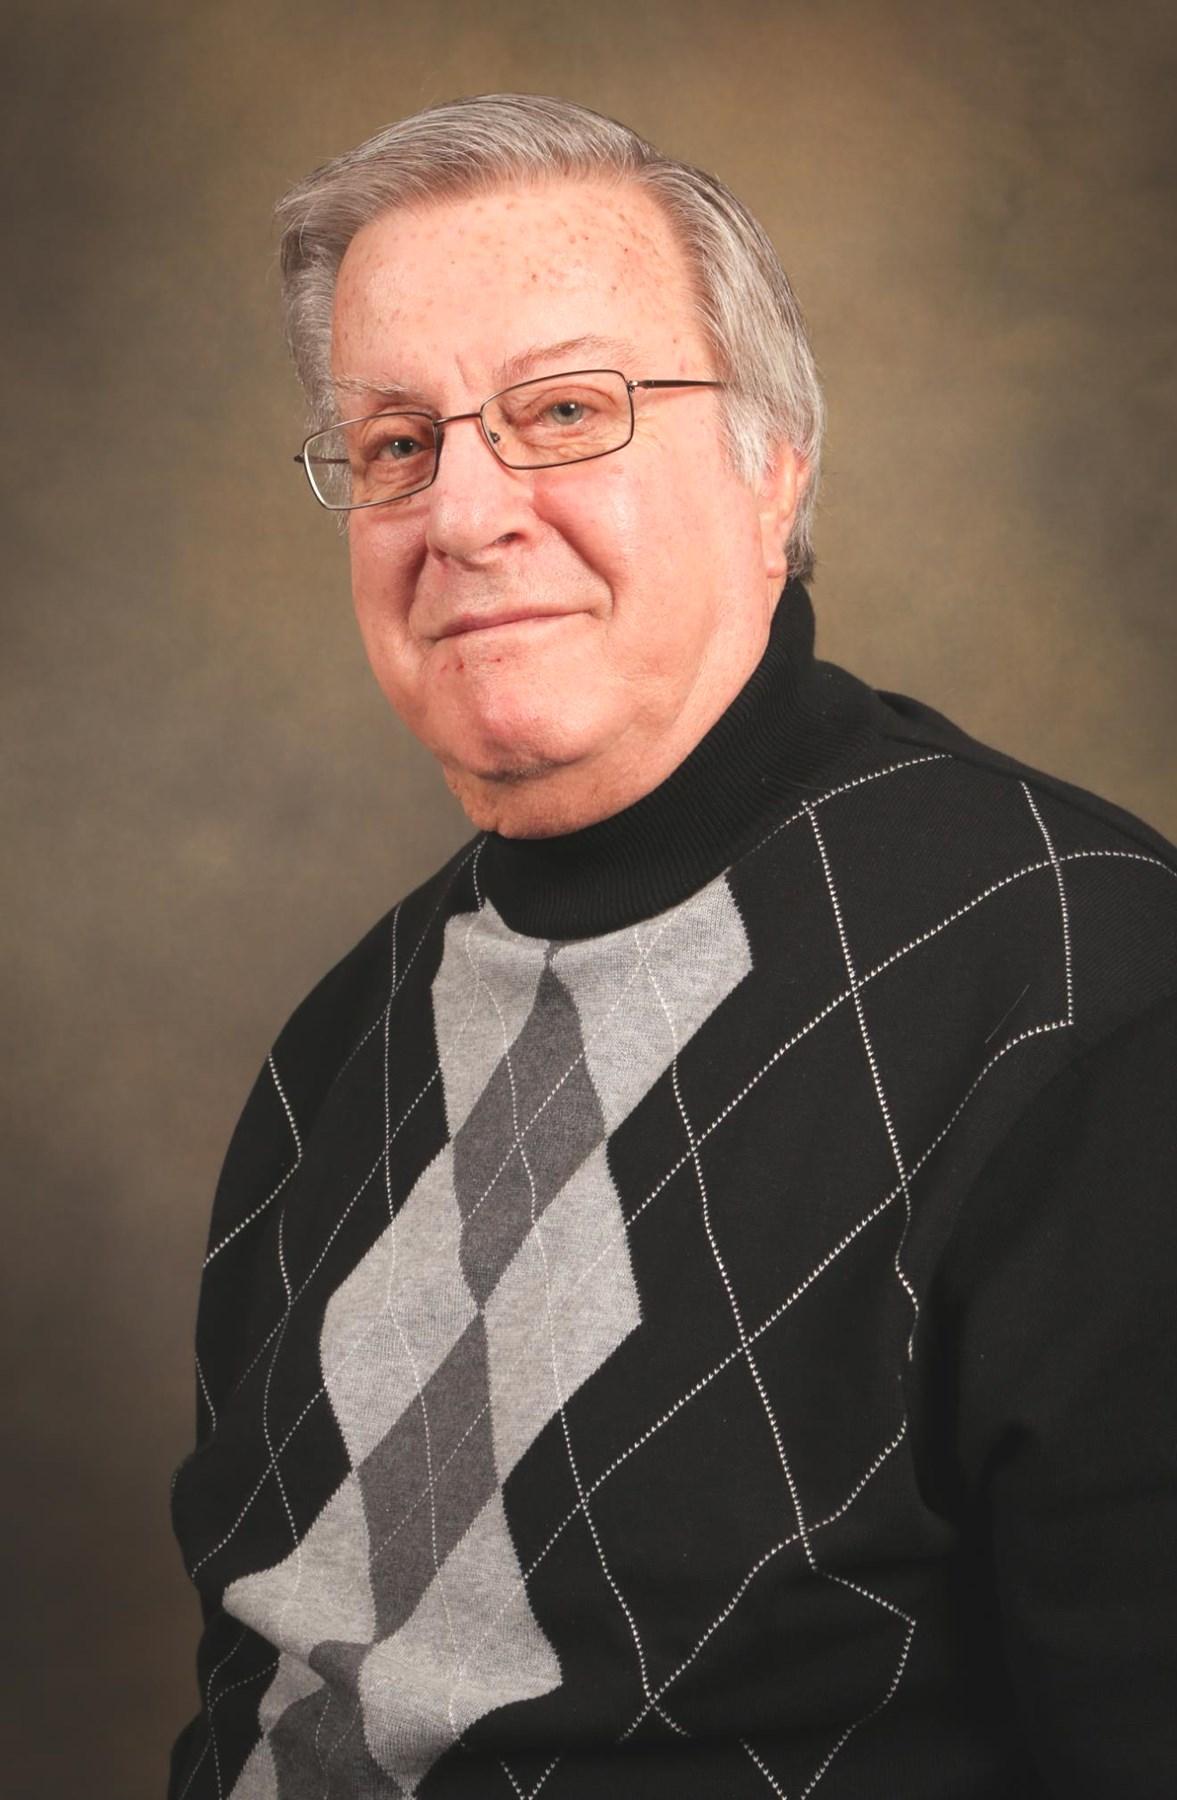 Mark A  Snyder Obituary - Springfield, IL